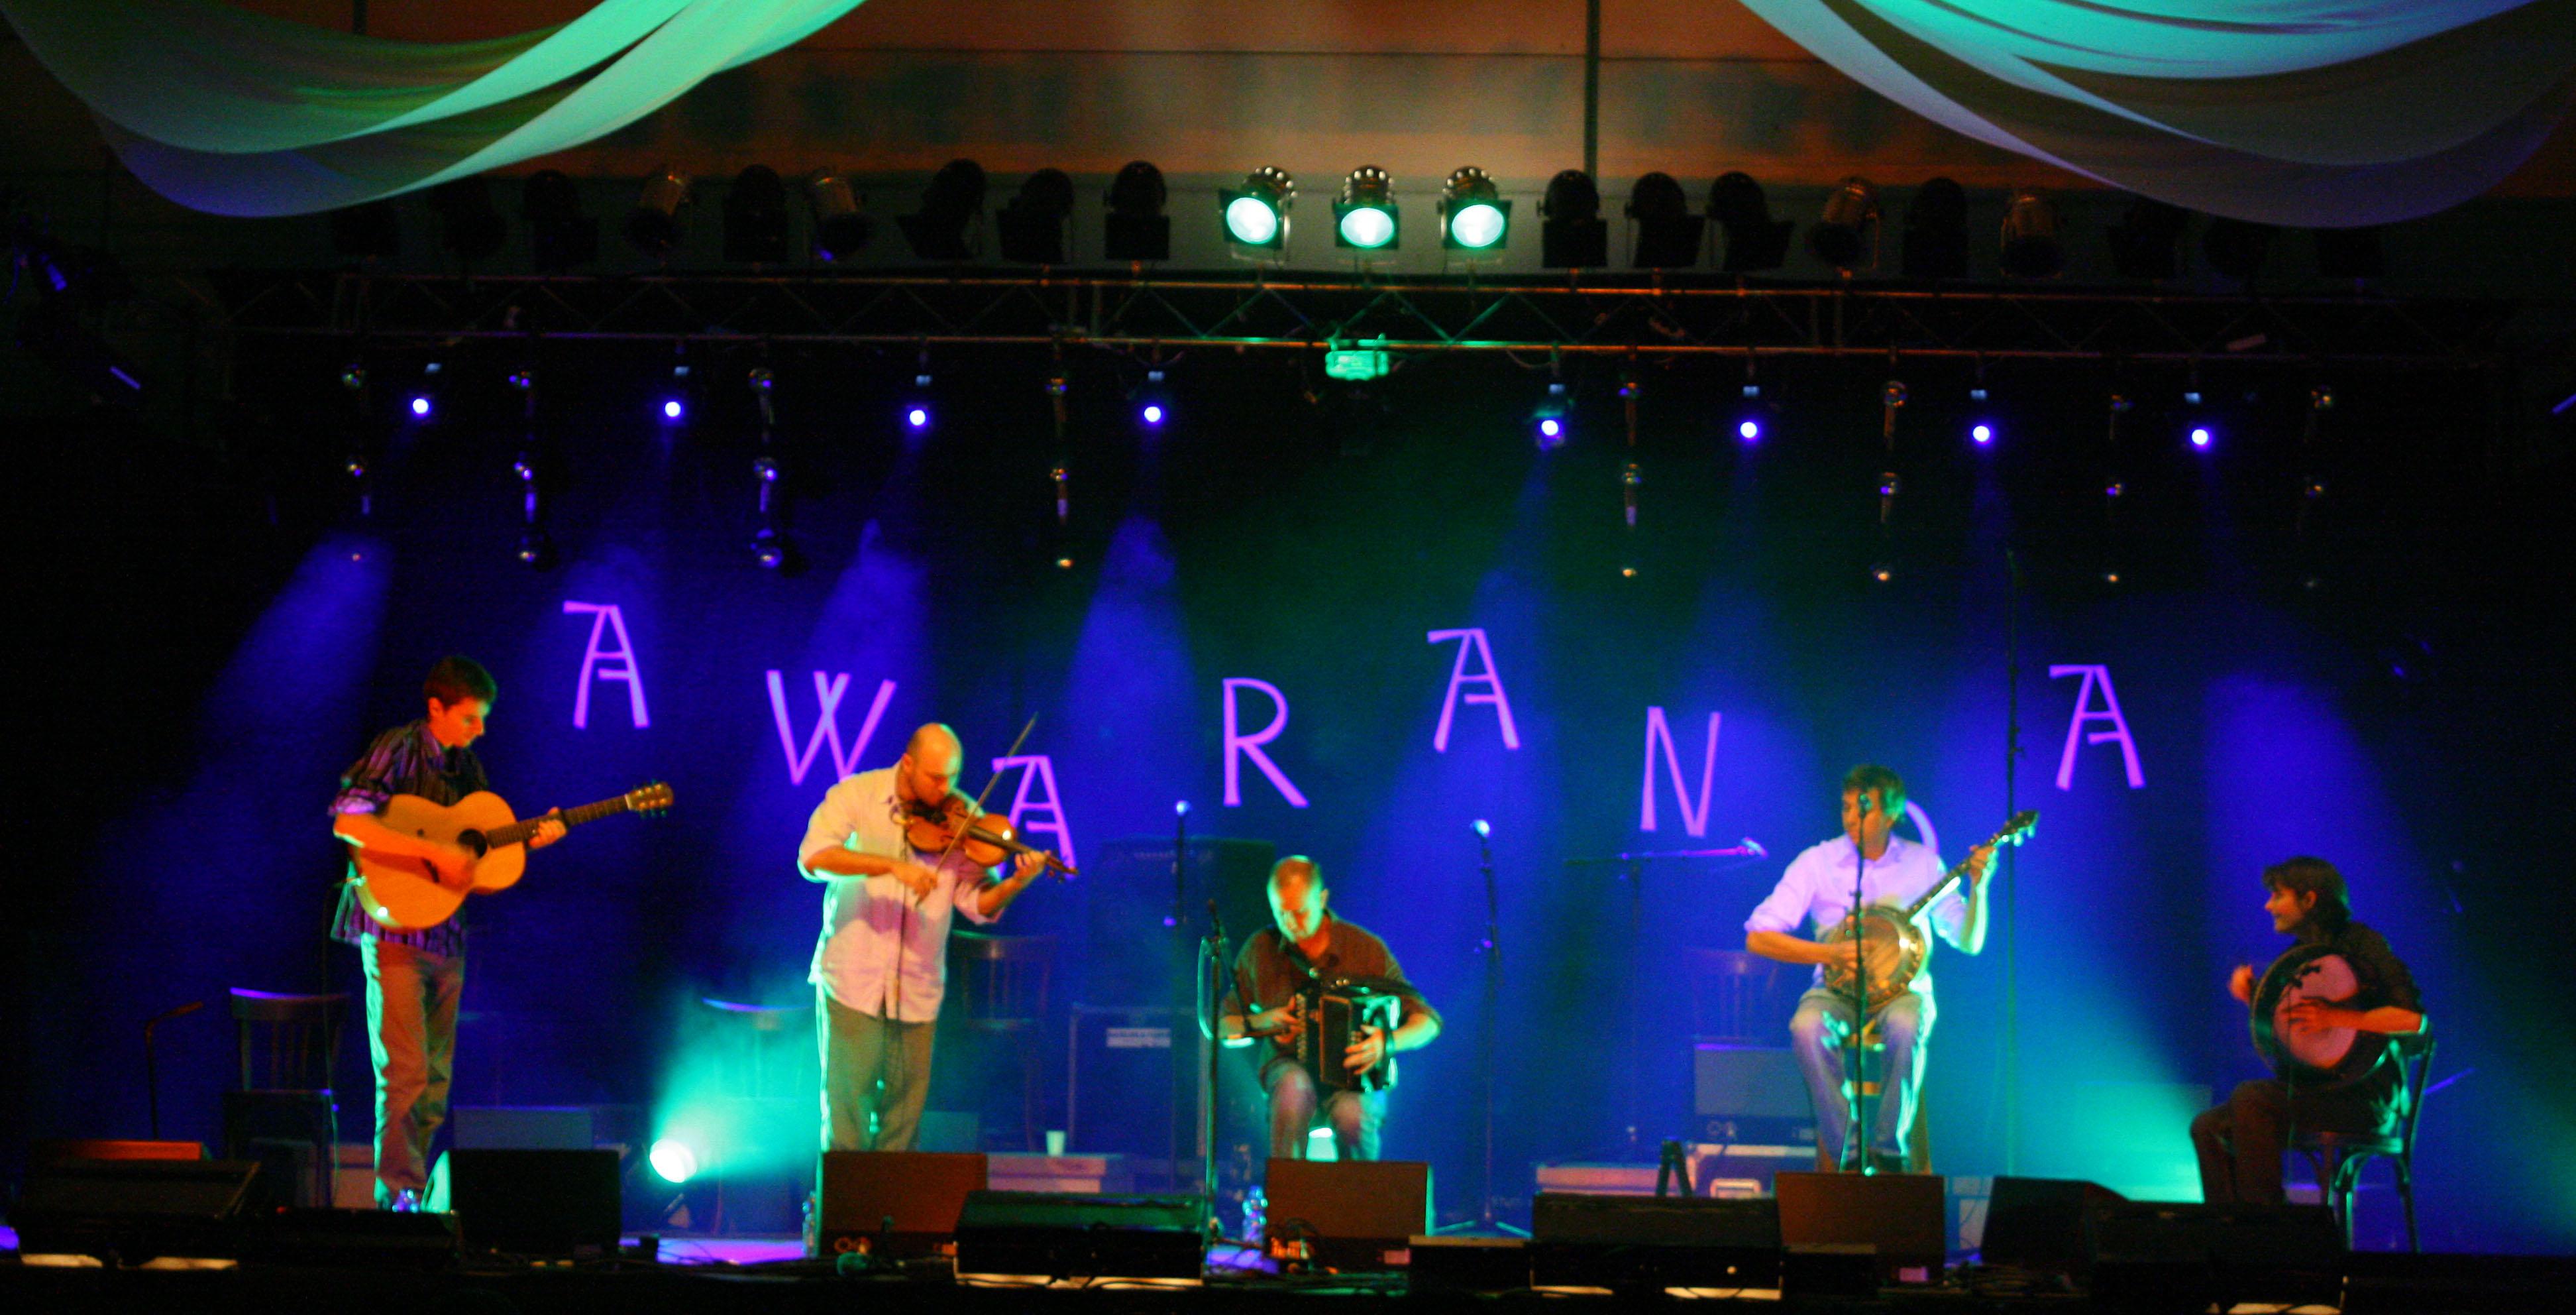 Festival Awaranda (2007)